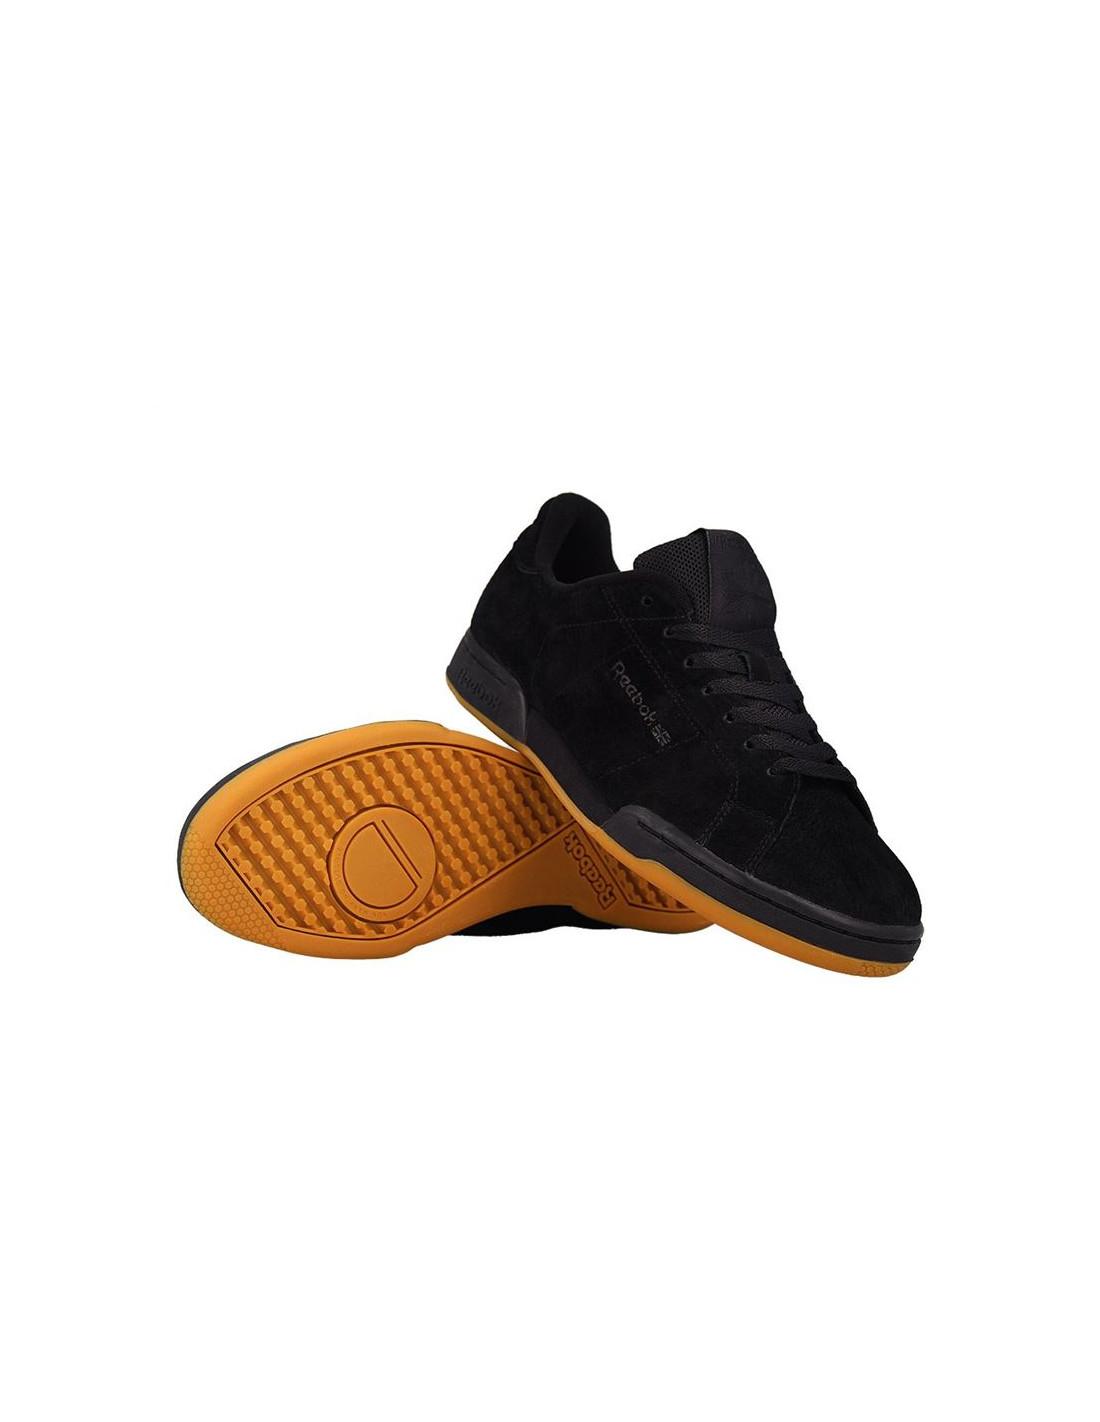 f5fe8eb8aaf61 ᐈ Zapatillas Reebok NPC II TG Black-Gum – Atmosfera Sport©